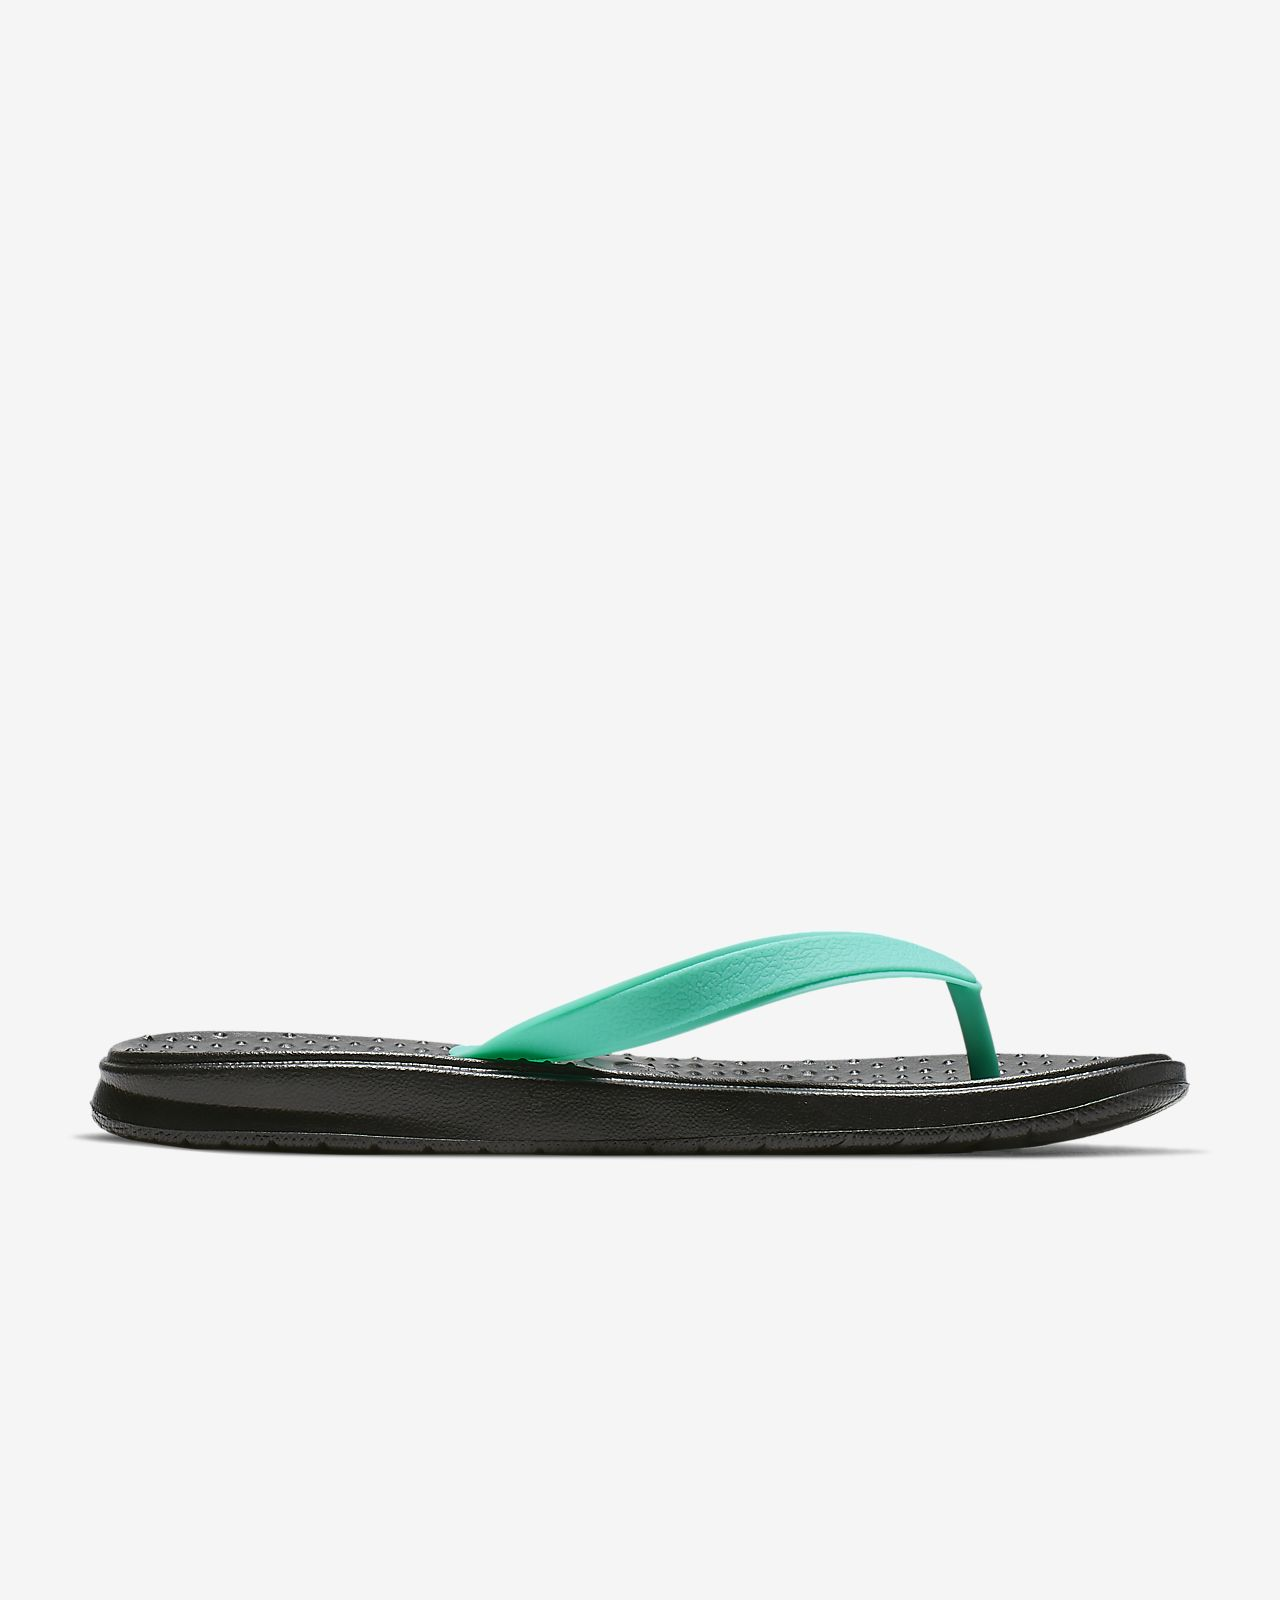 42663a9ba48f Nike Solay Women s Flip-Flop. Nike.com SG